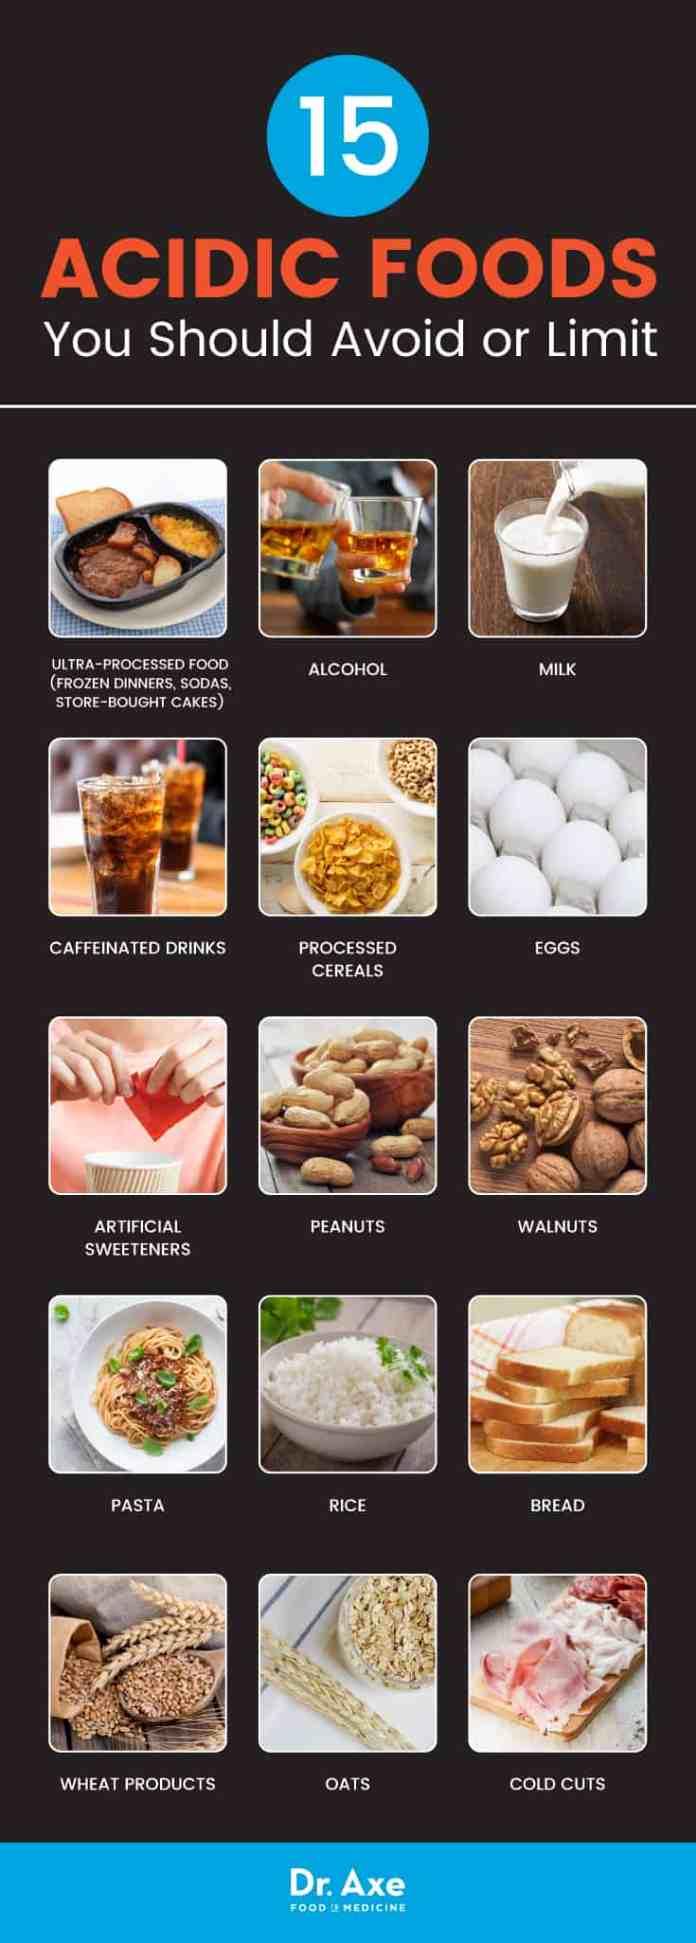 15 Acidic Foods To Avoid Healthier Alternatives Health